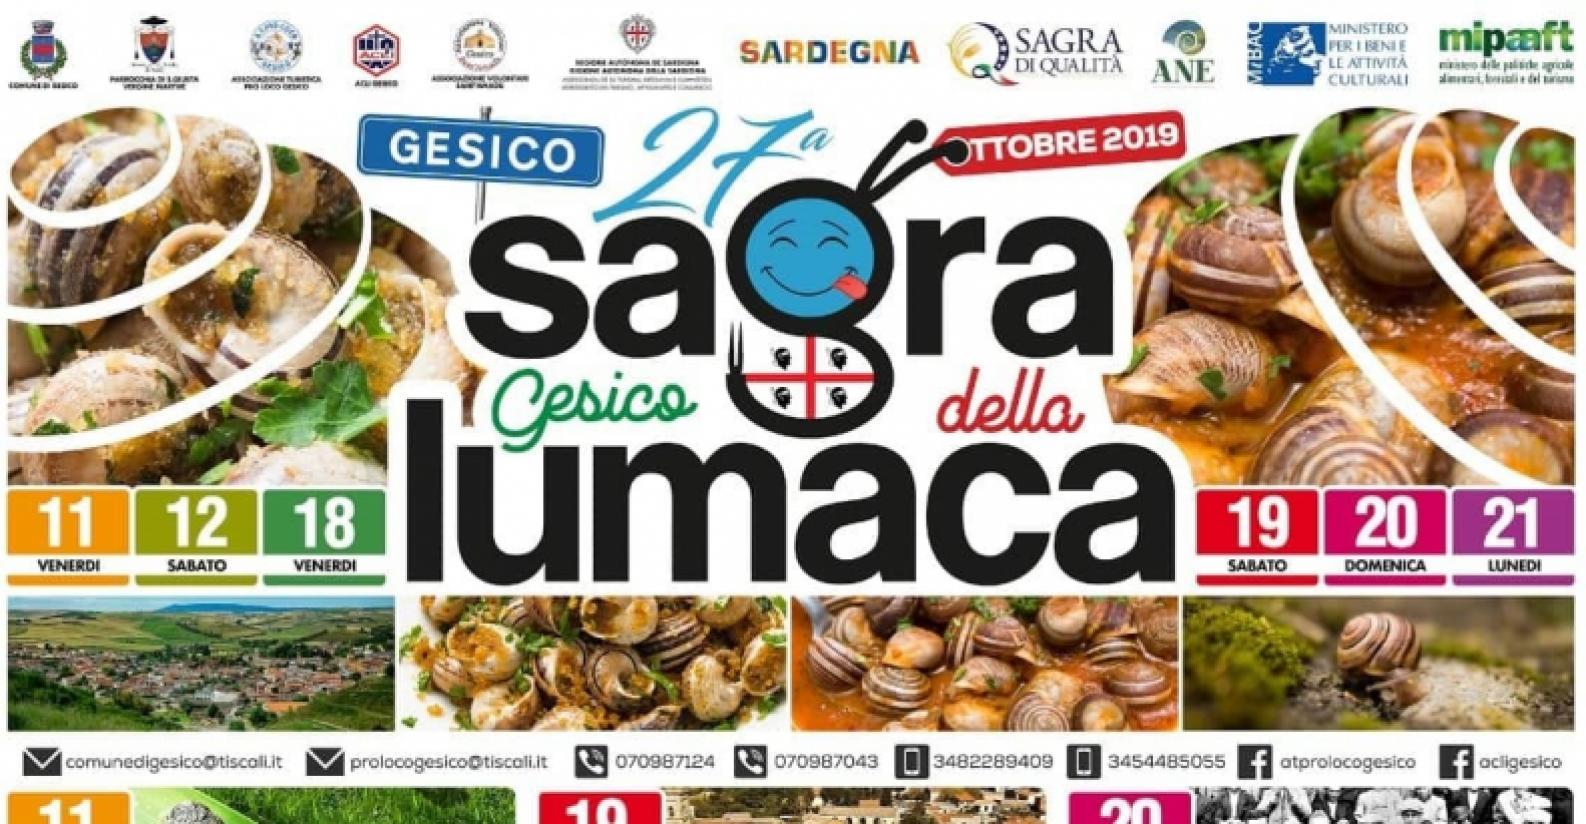 27_sagra_della_lumaca